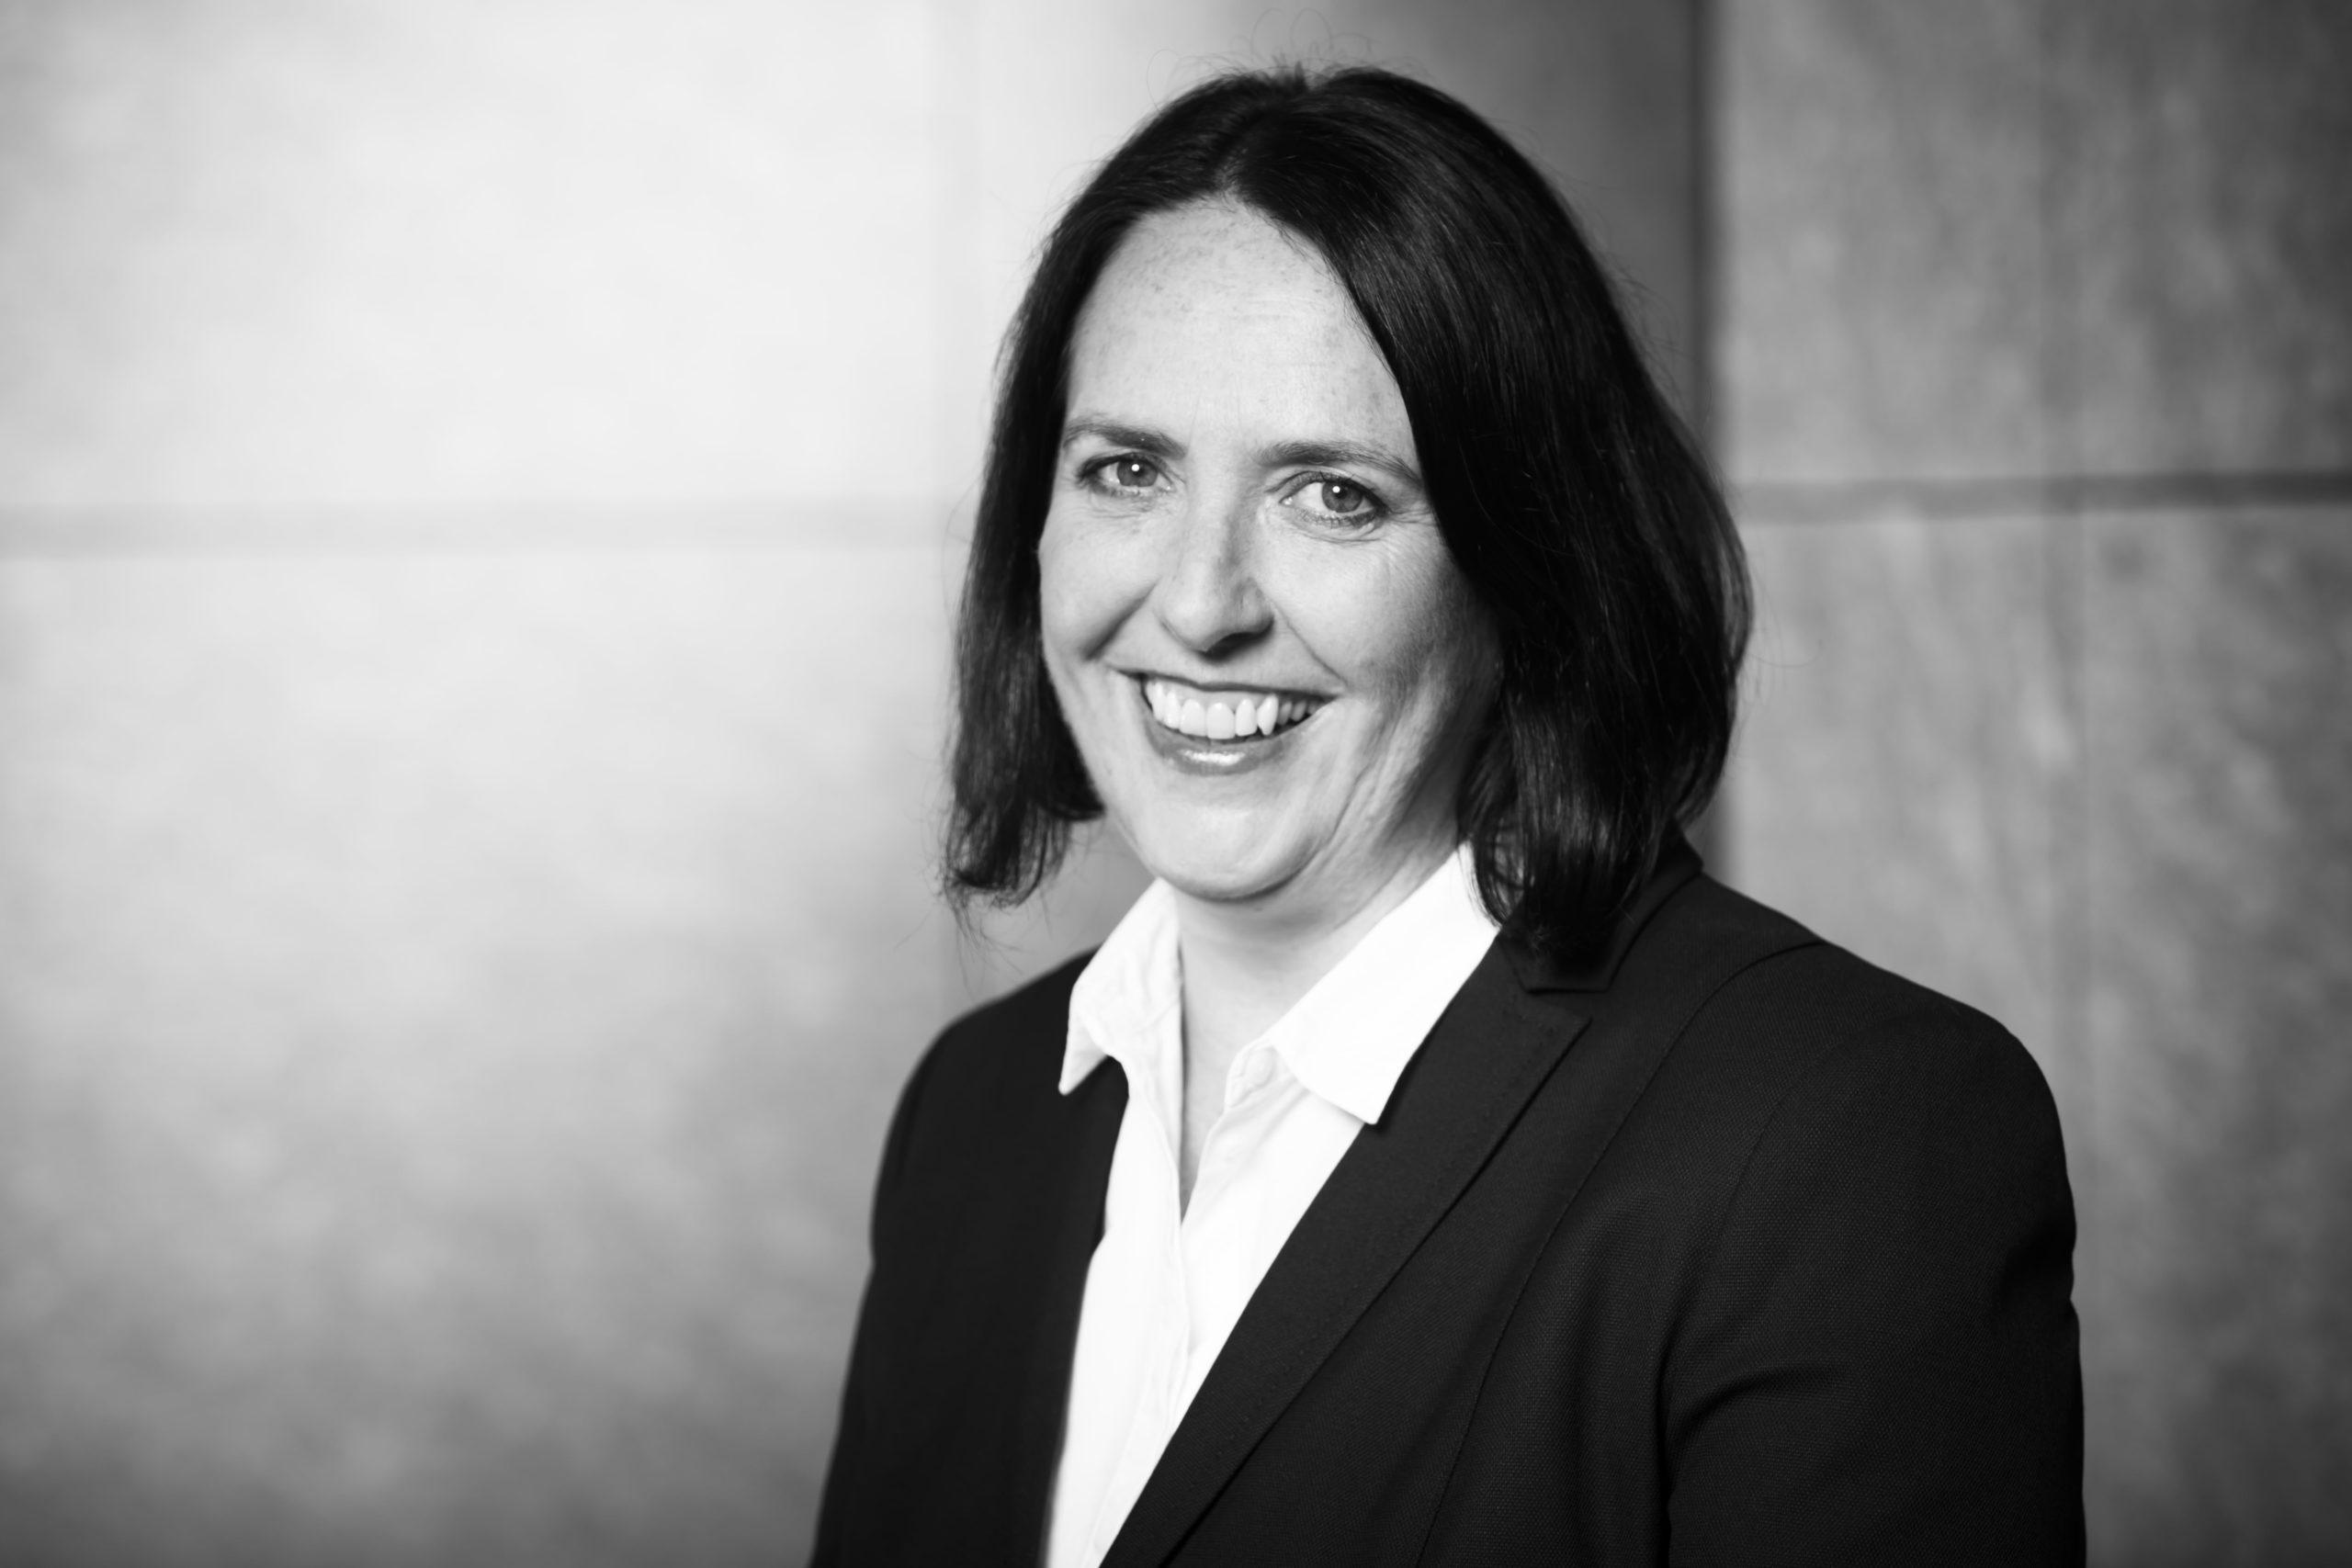 Account Director Helen Mack HBI